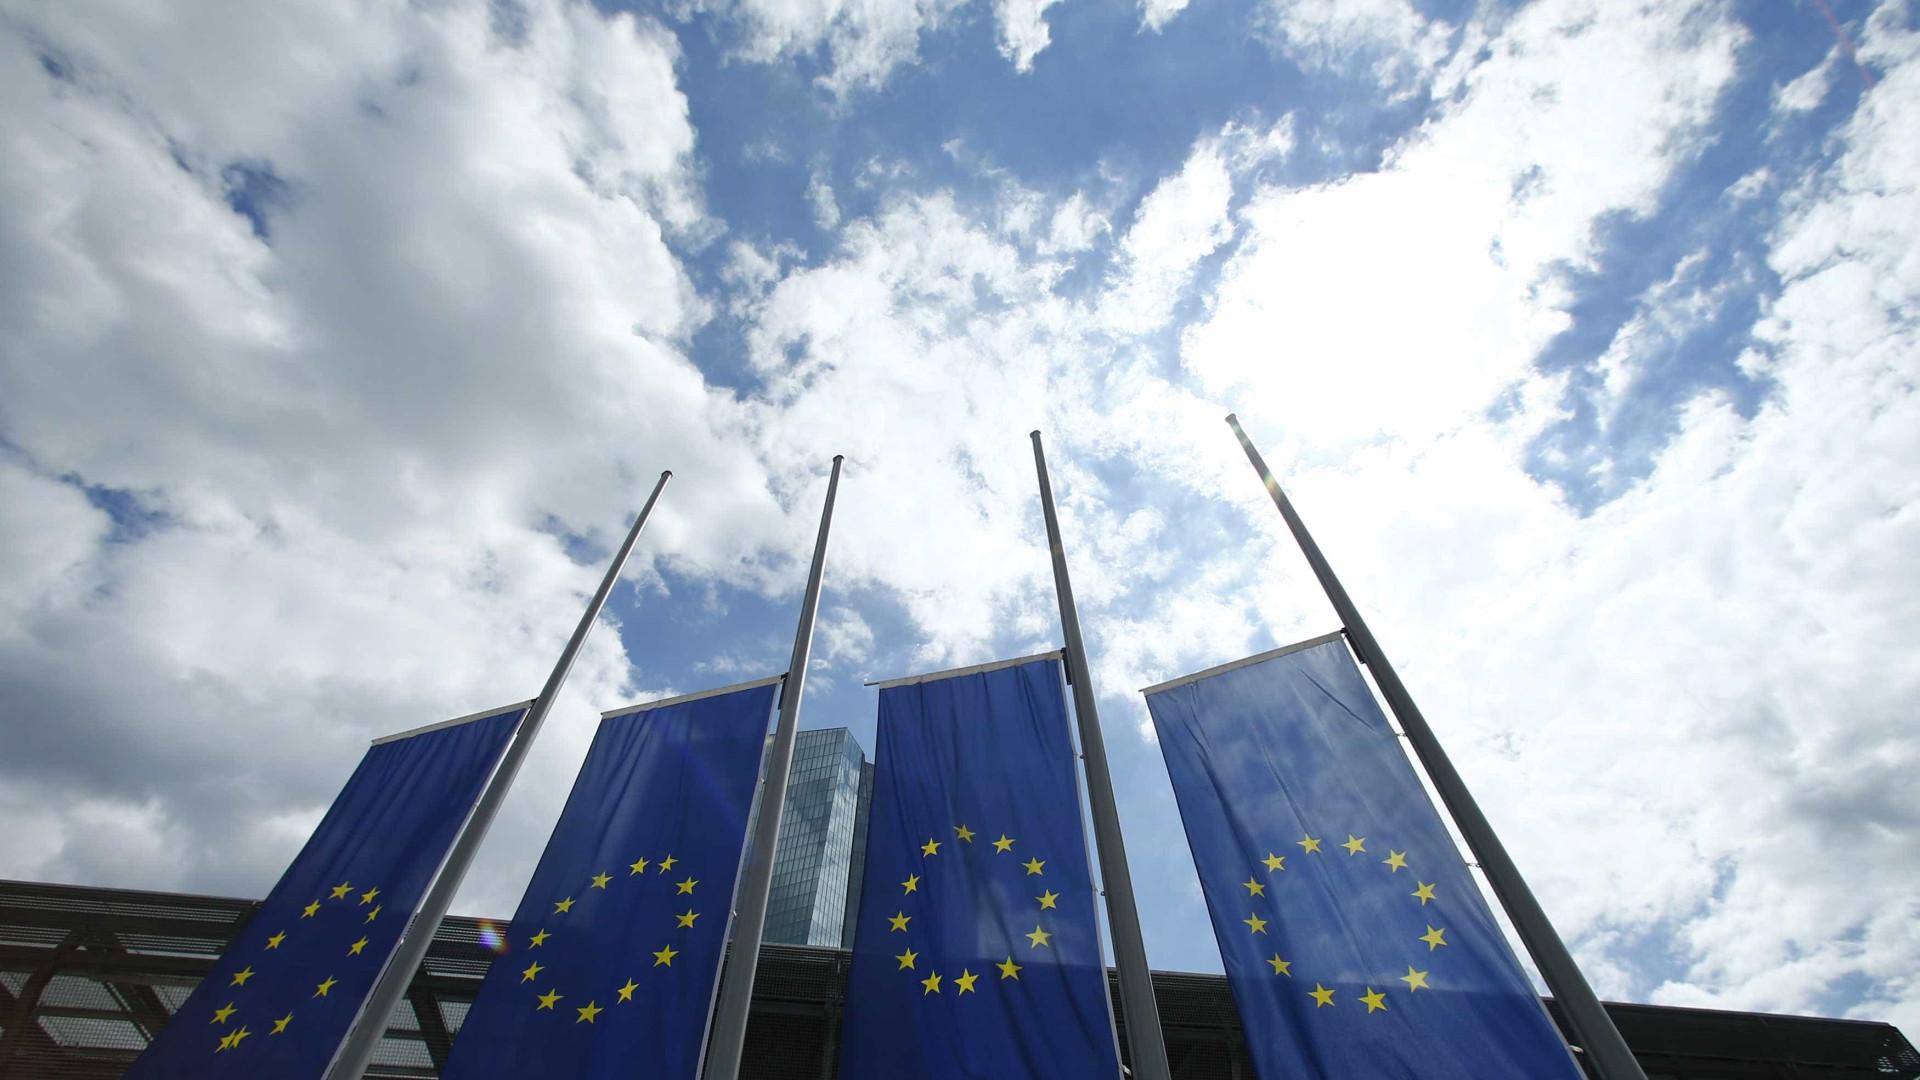 Síria: Líderes da UE pretendem condenar fortemente a Rússia